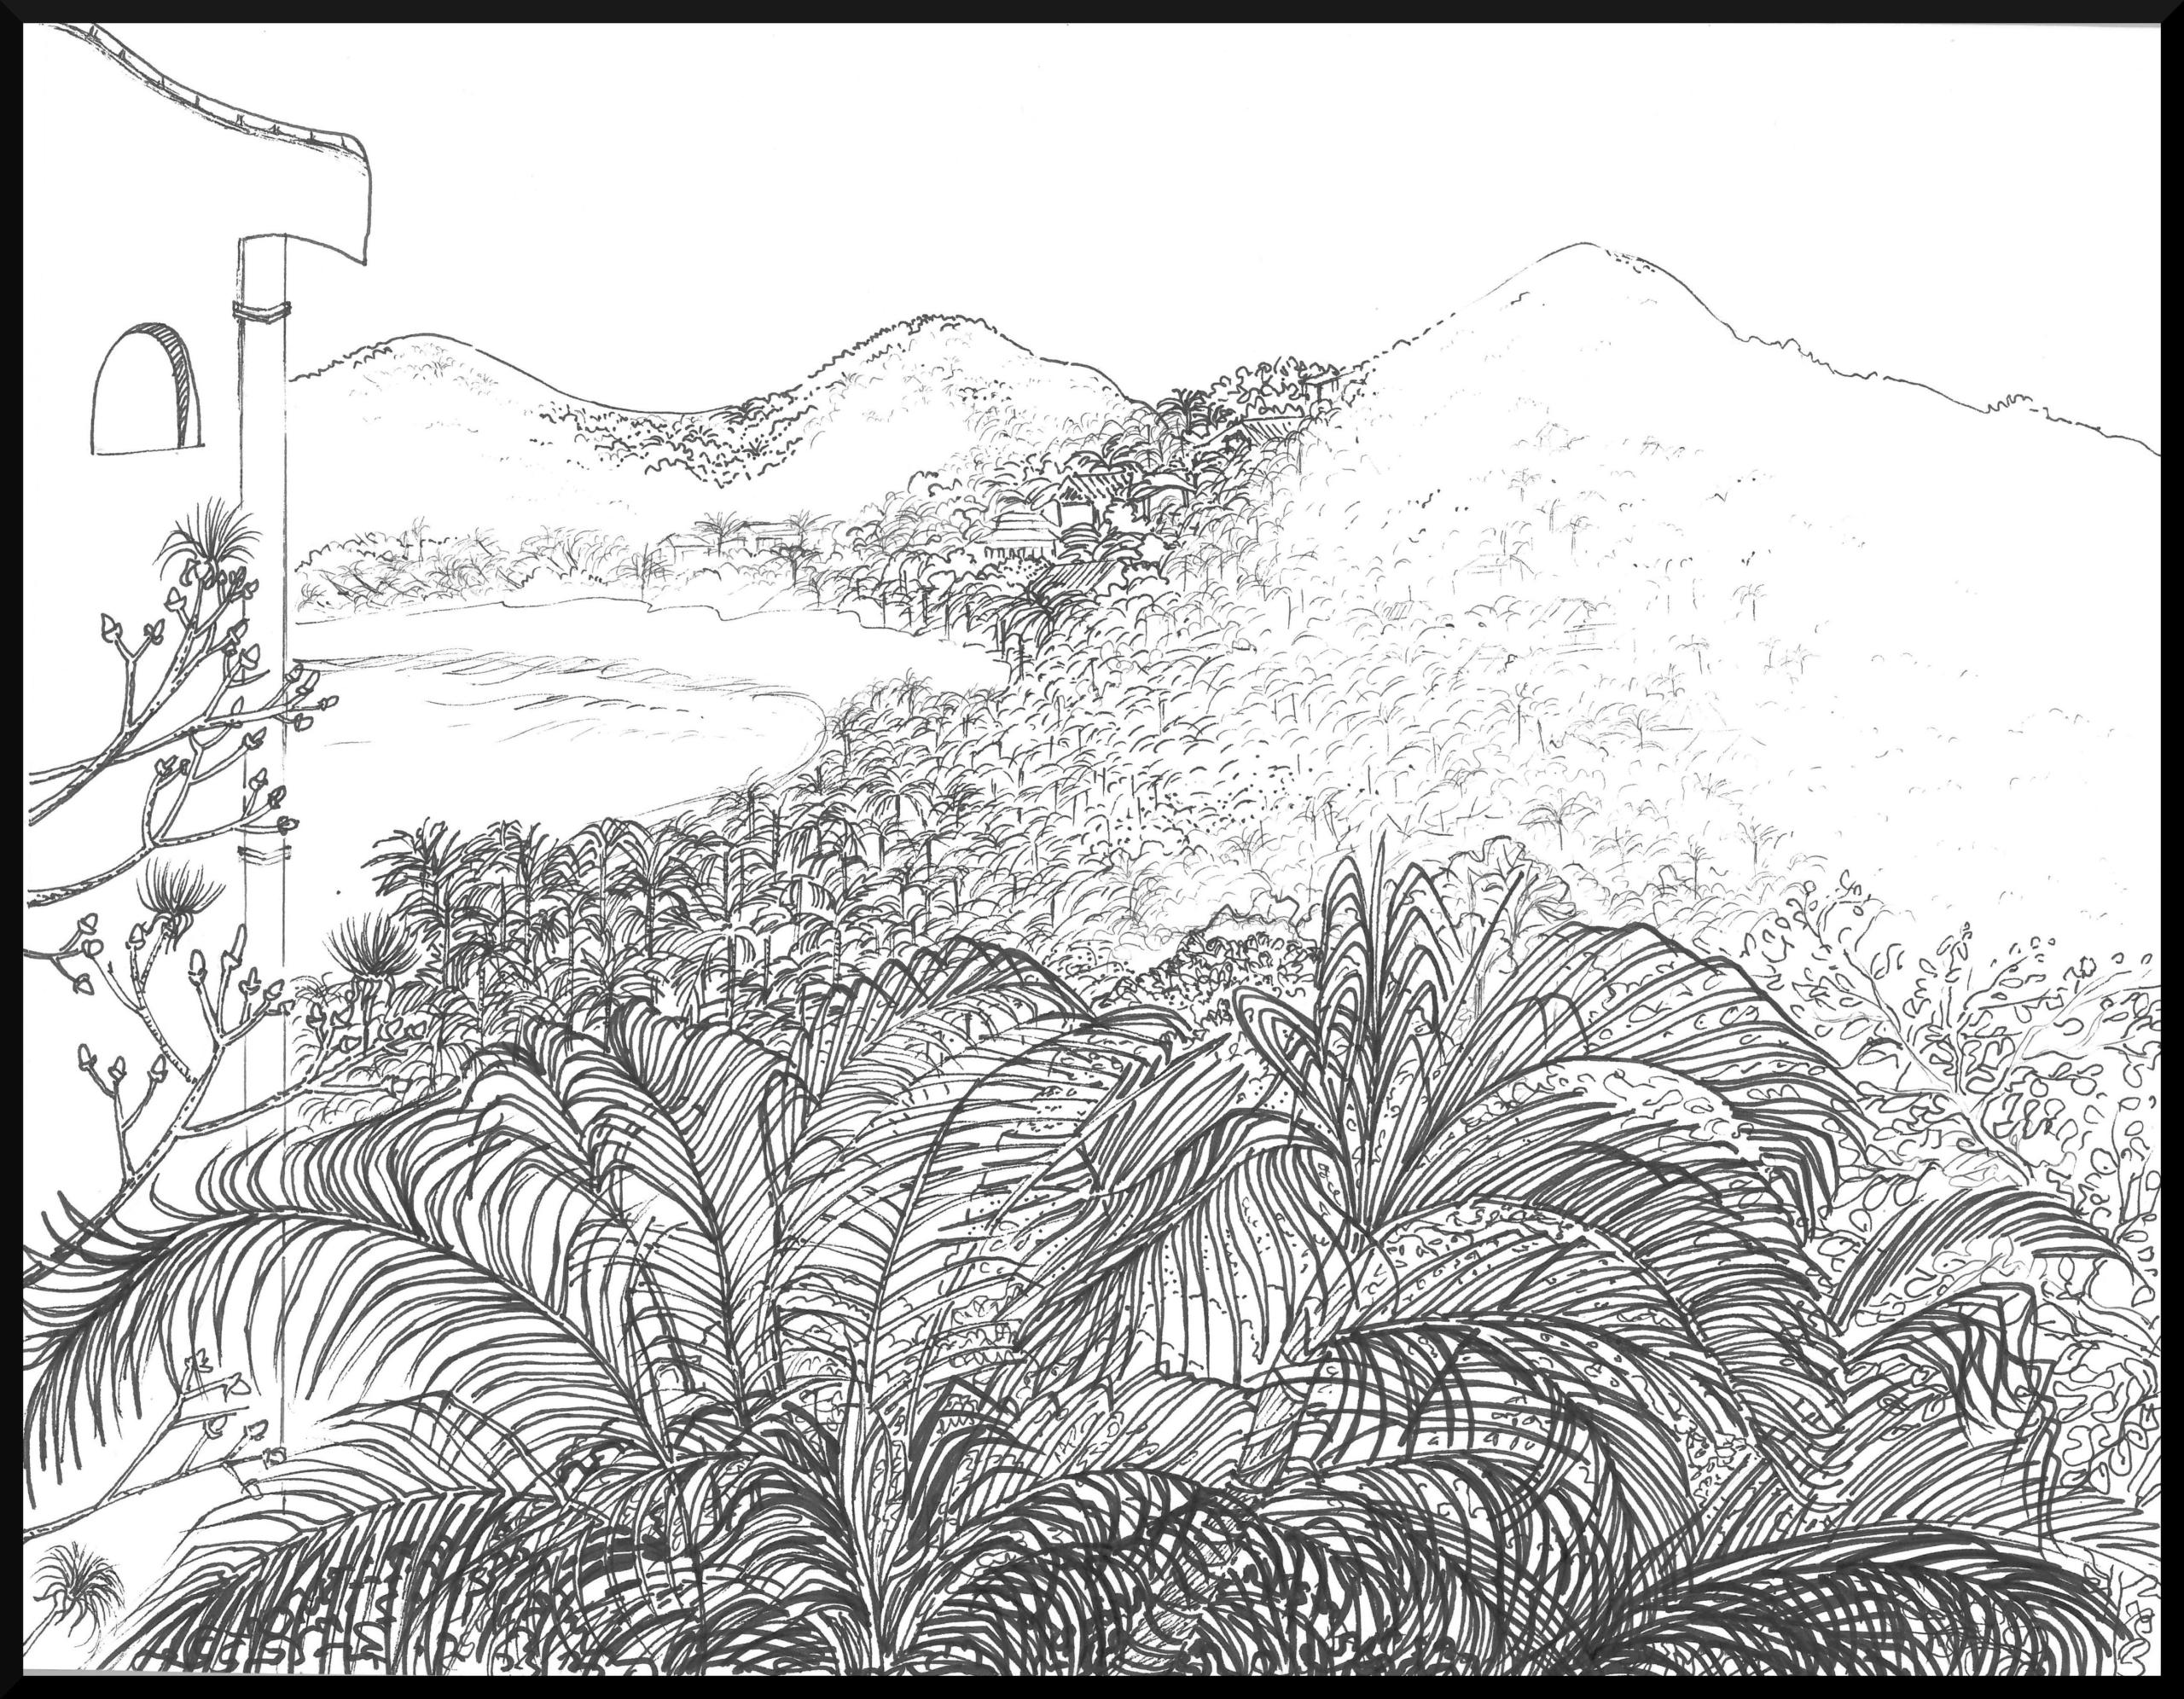 Sayulita 2 - from the mountains to the sea - Bela Ravikumar